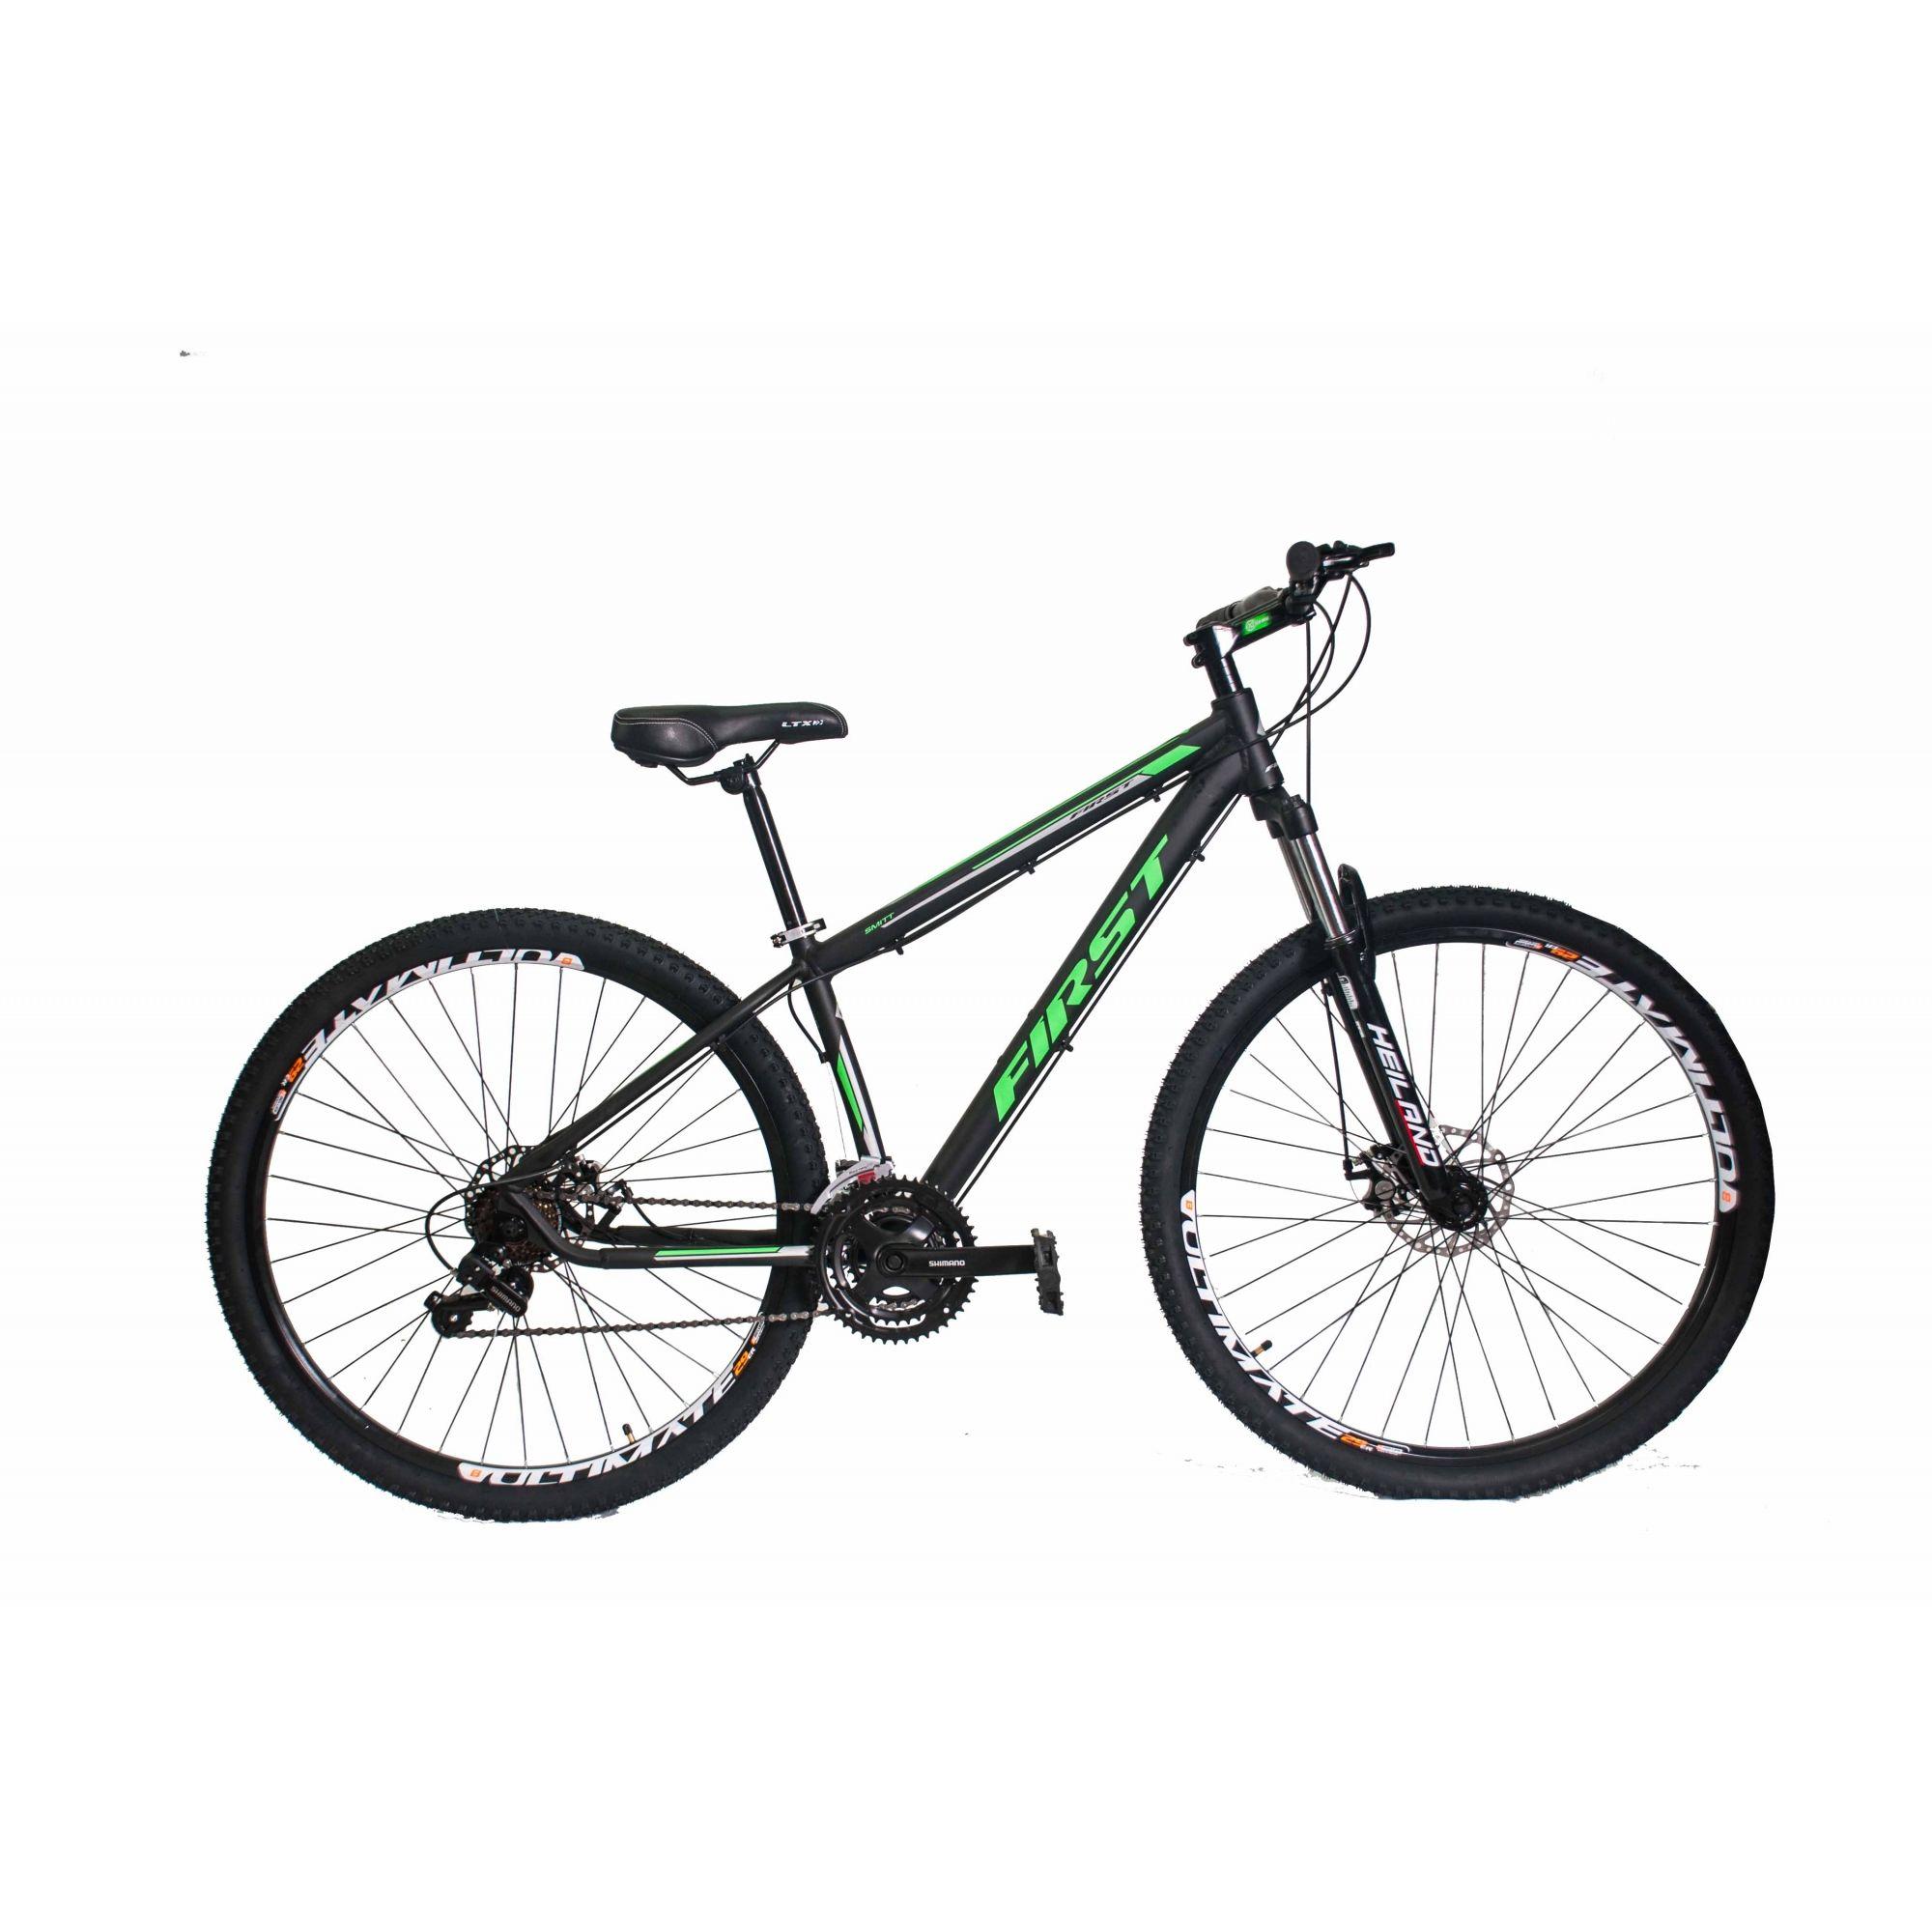 765e1363a Bicicleta 29 FIRST SMITT - Shimano completo - freio a disco 21 Marchas -  Extremebike ...